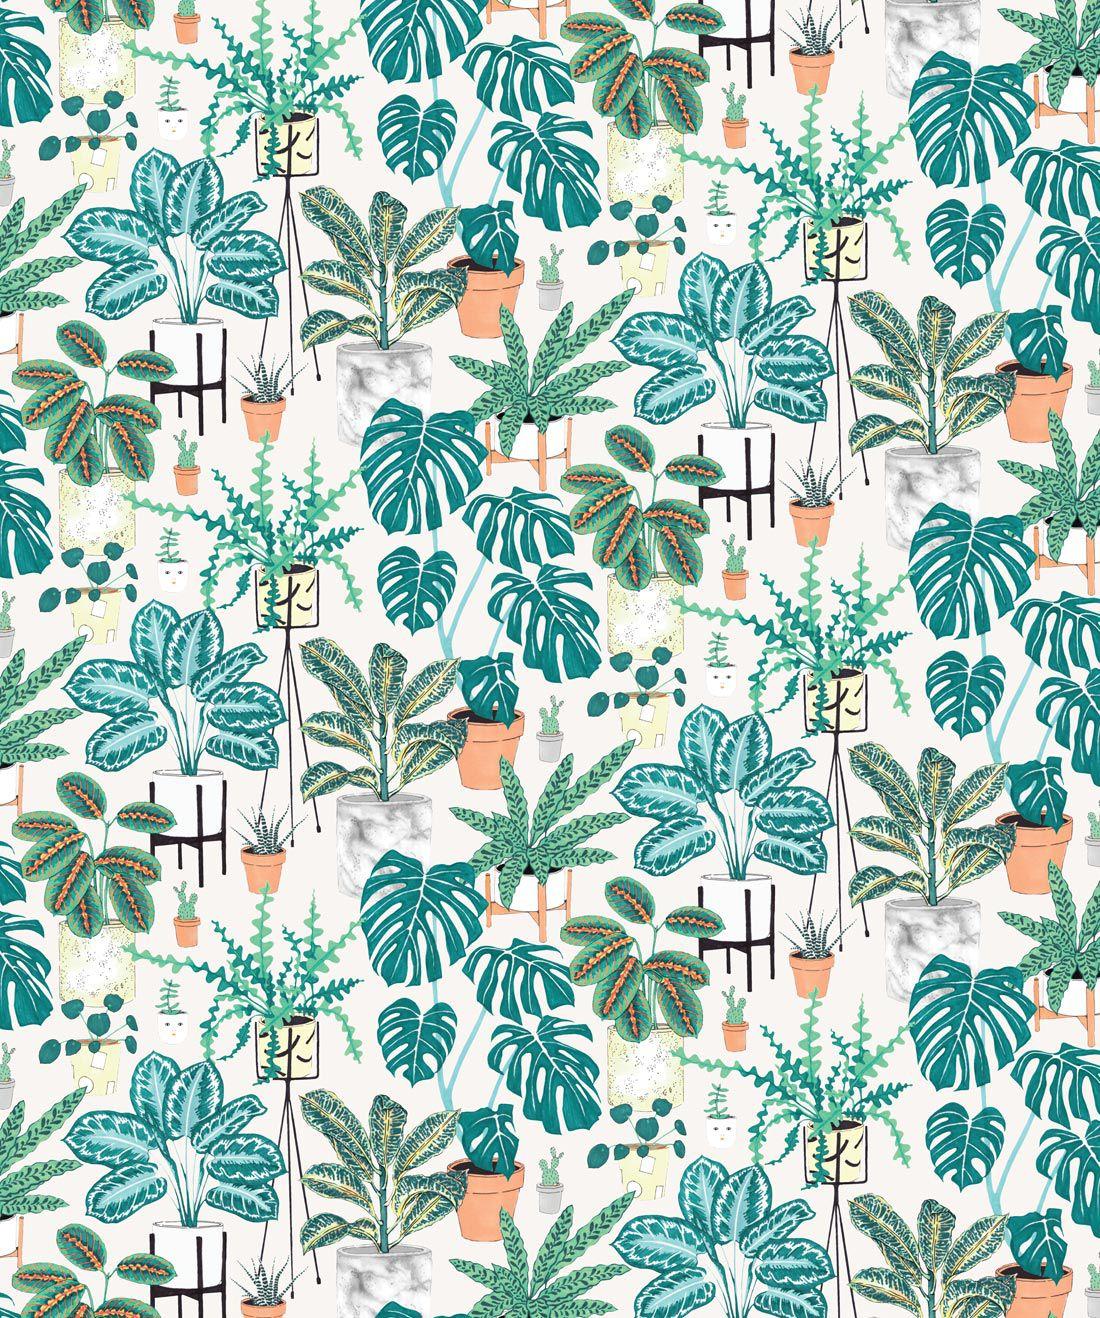 House Plants Wallpaper